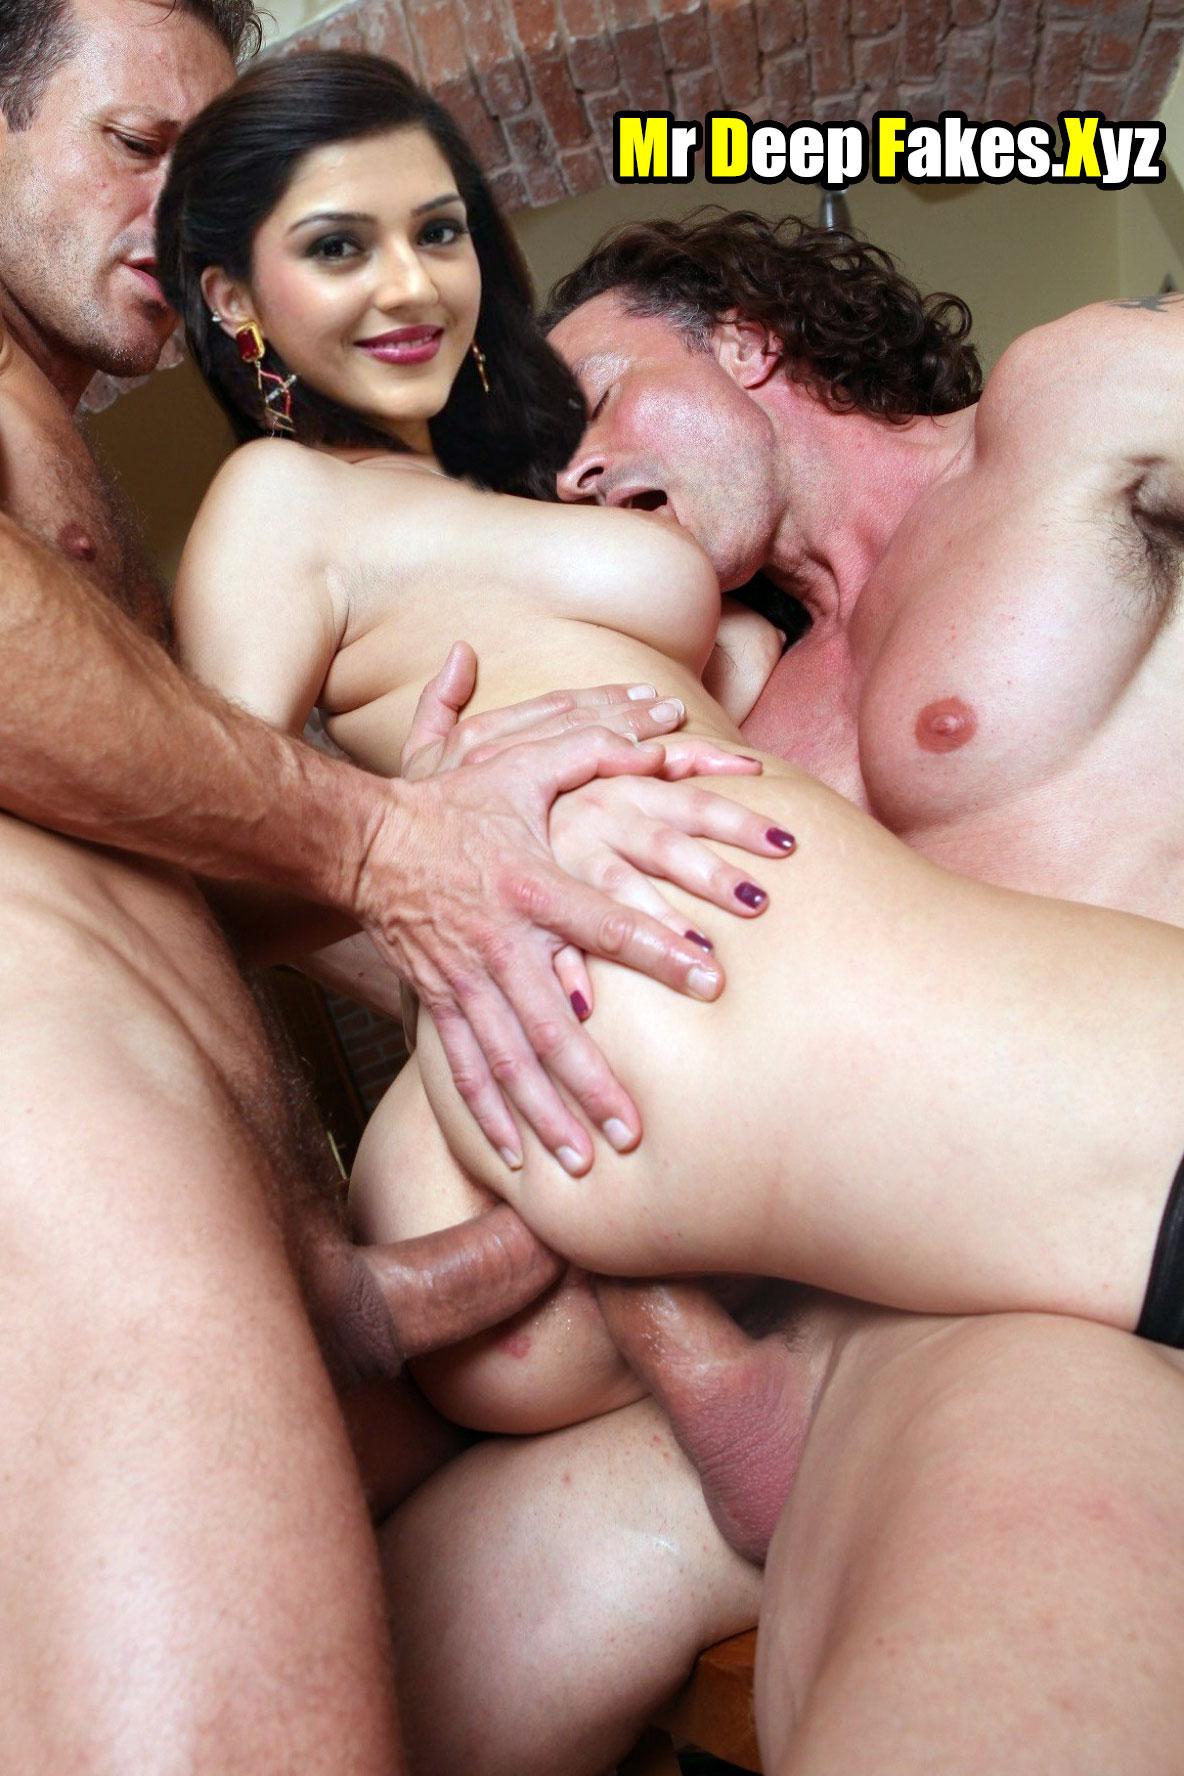 Mehrene Kaur Pirzada naked double penetration threesome standing sex deepfakes